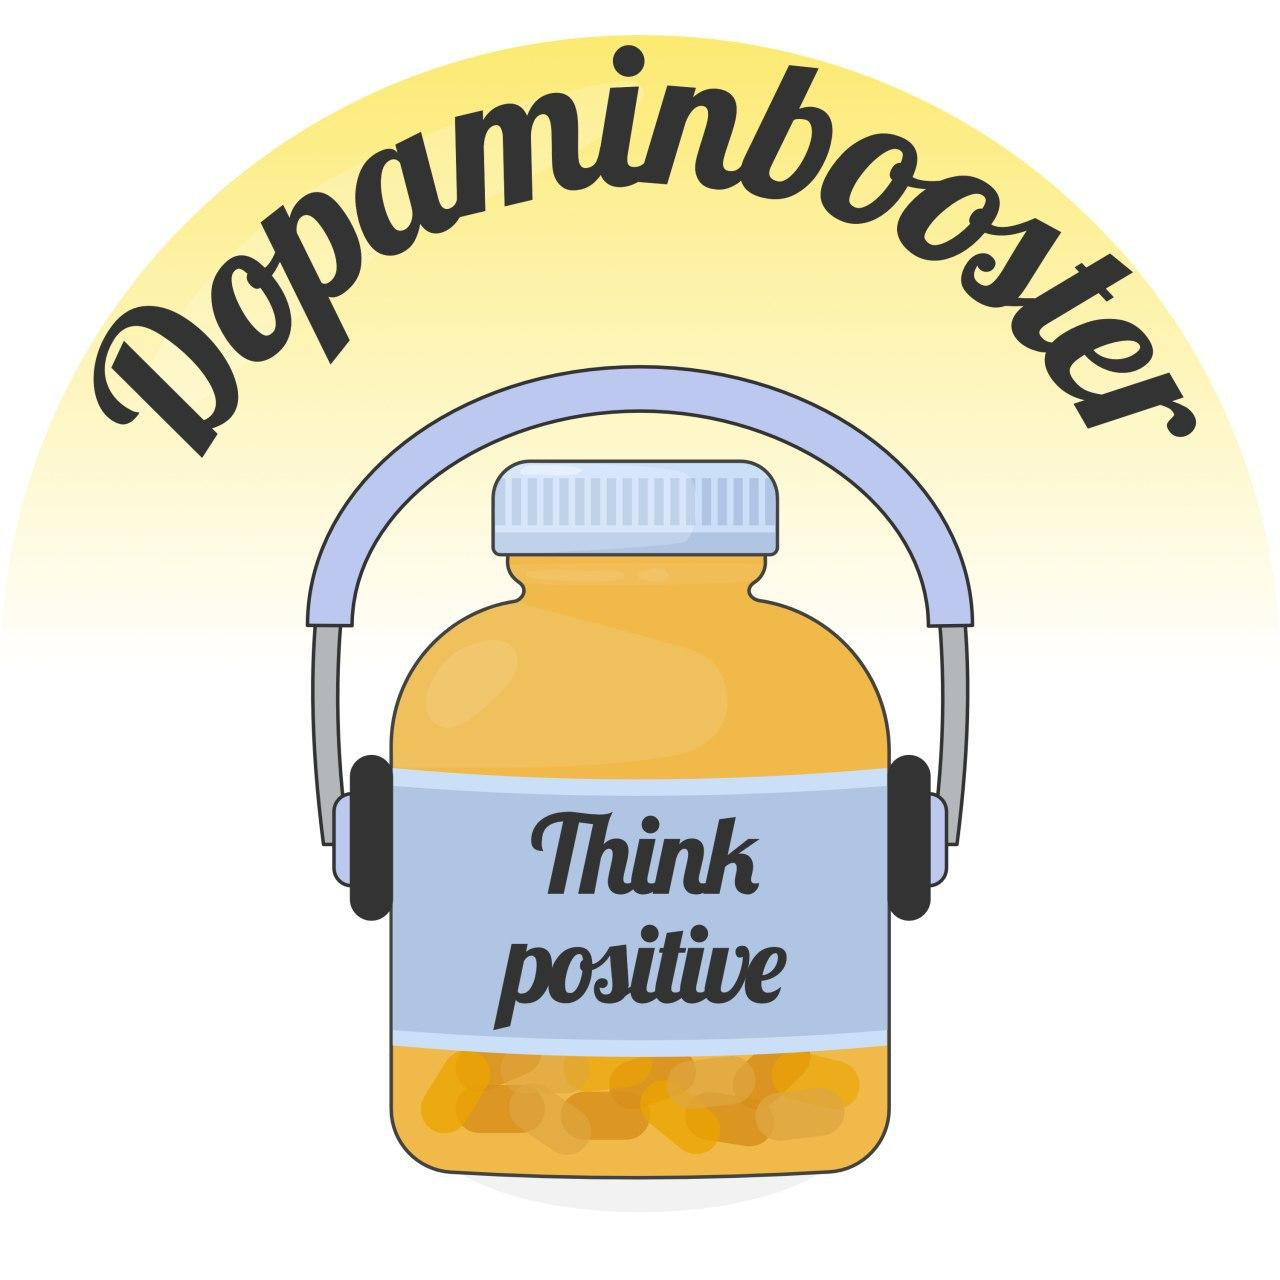 Dopaminbooster